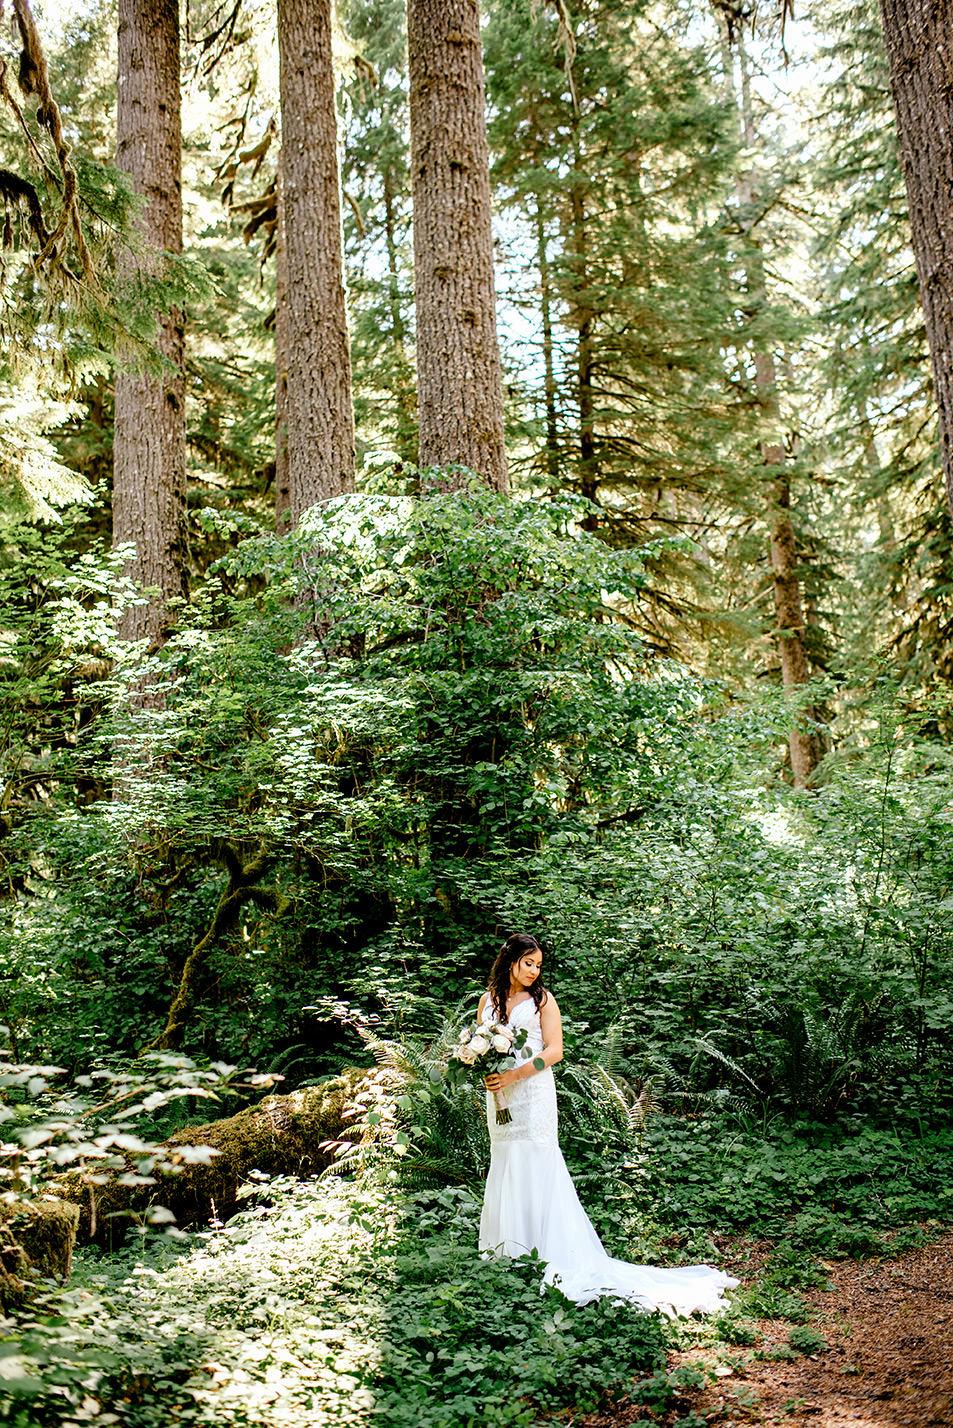 Silver-falls-state-park-wedding-96.jpg